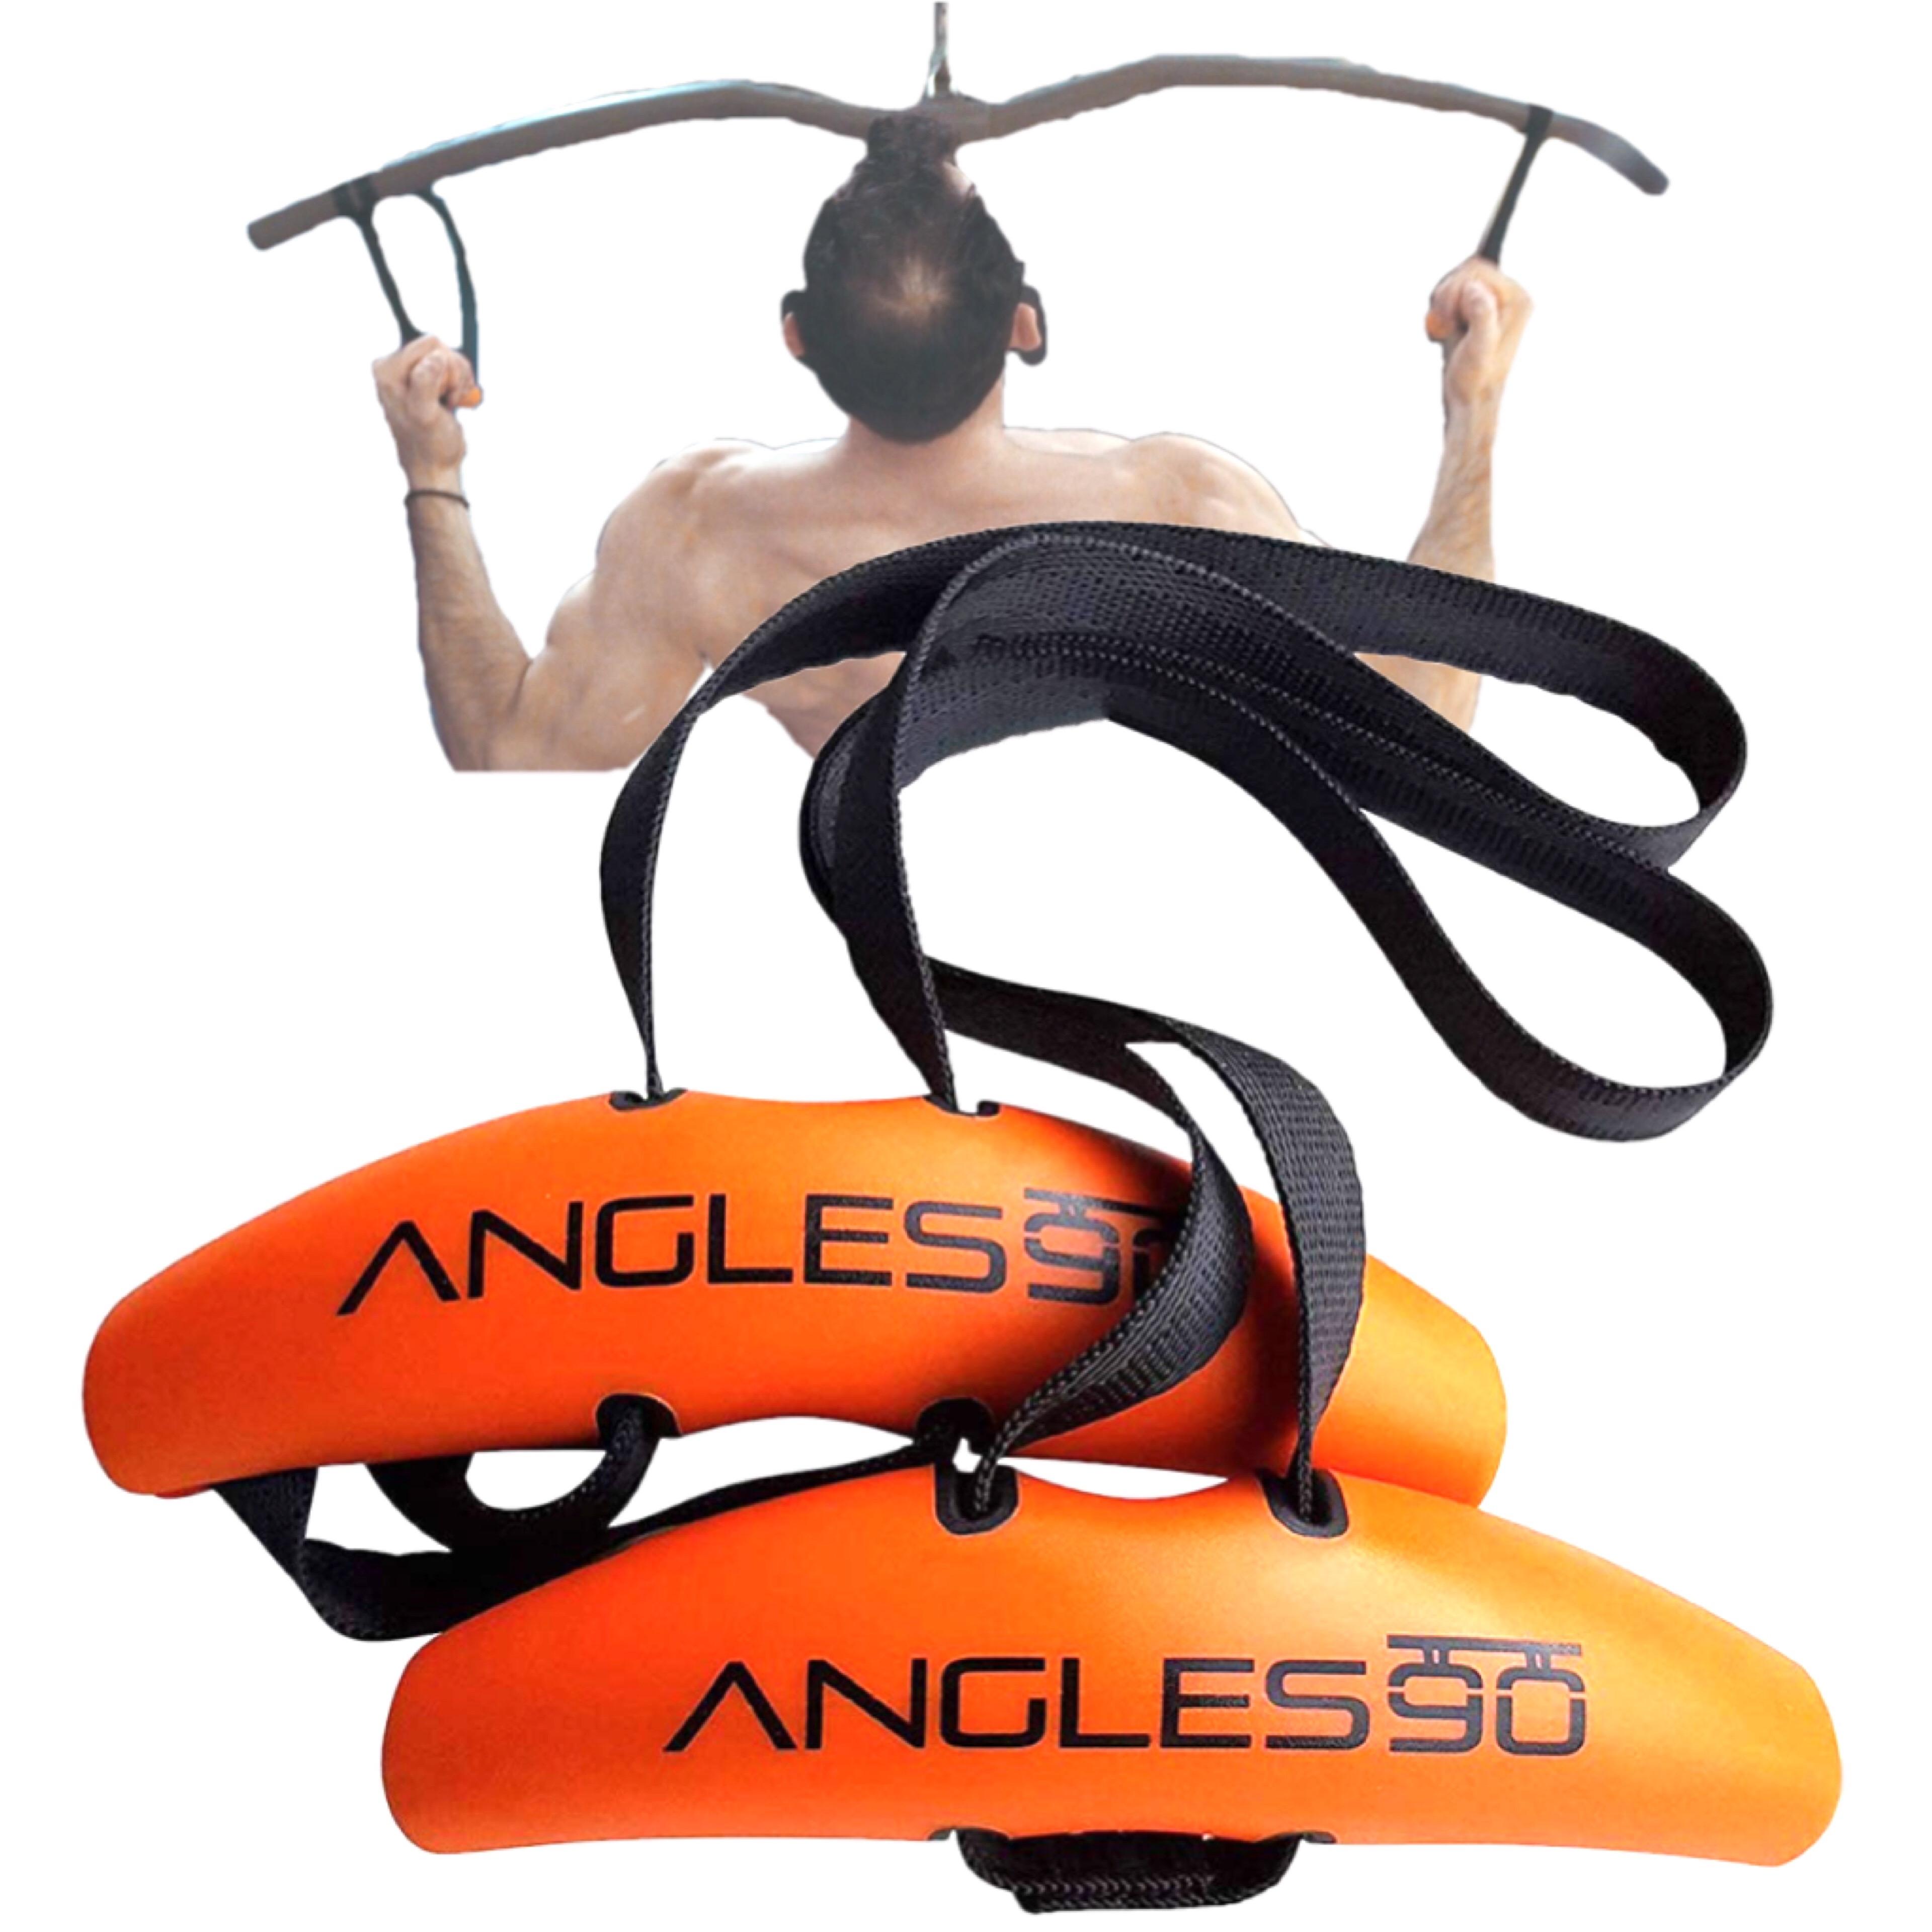 Angles90 アングレス90 グリップセット 懸垂補助器具 優先配送 ケーブルアタッチメント 予約販売品 イタリア製